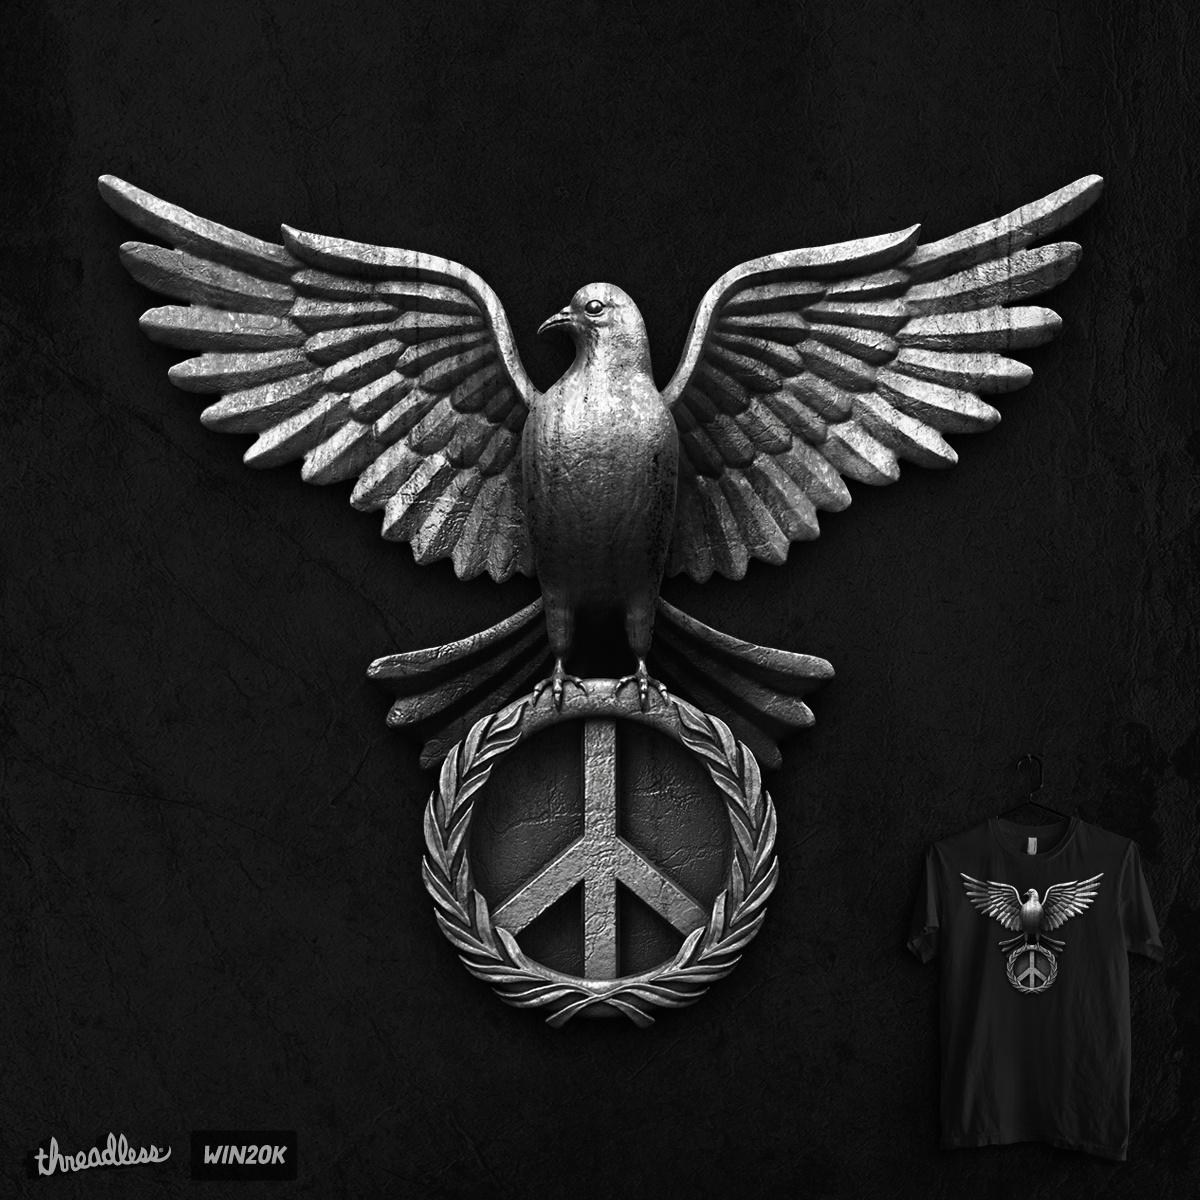 Pigeonism by idilek on Threadless